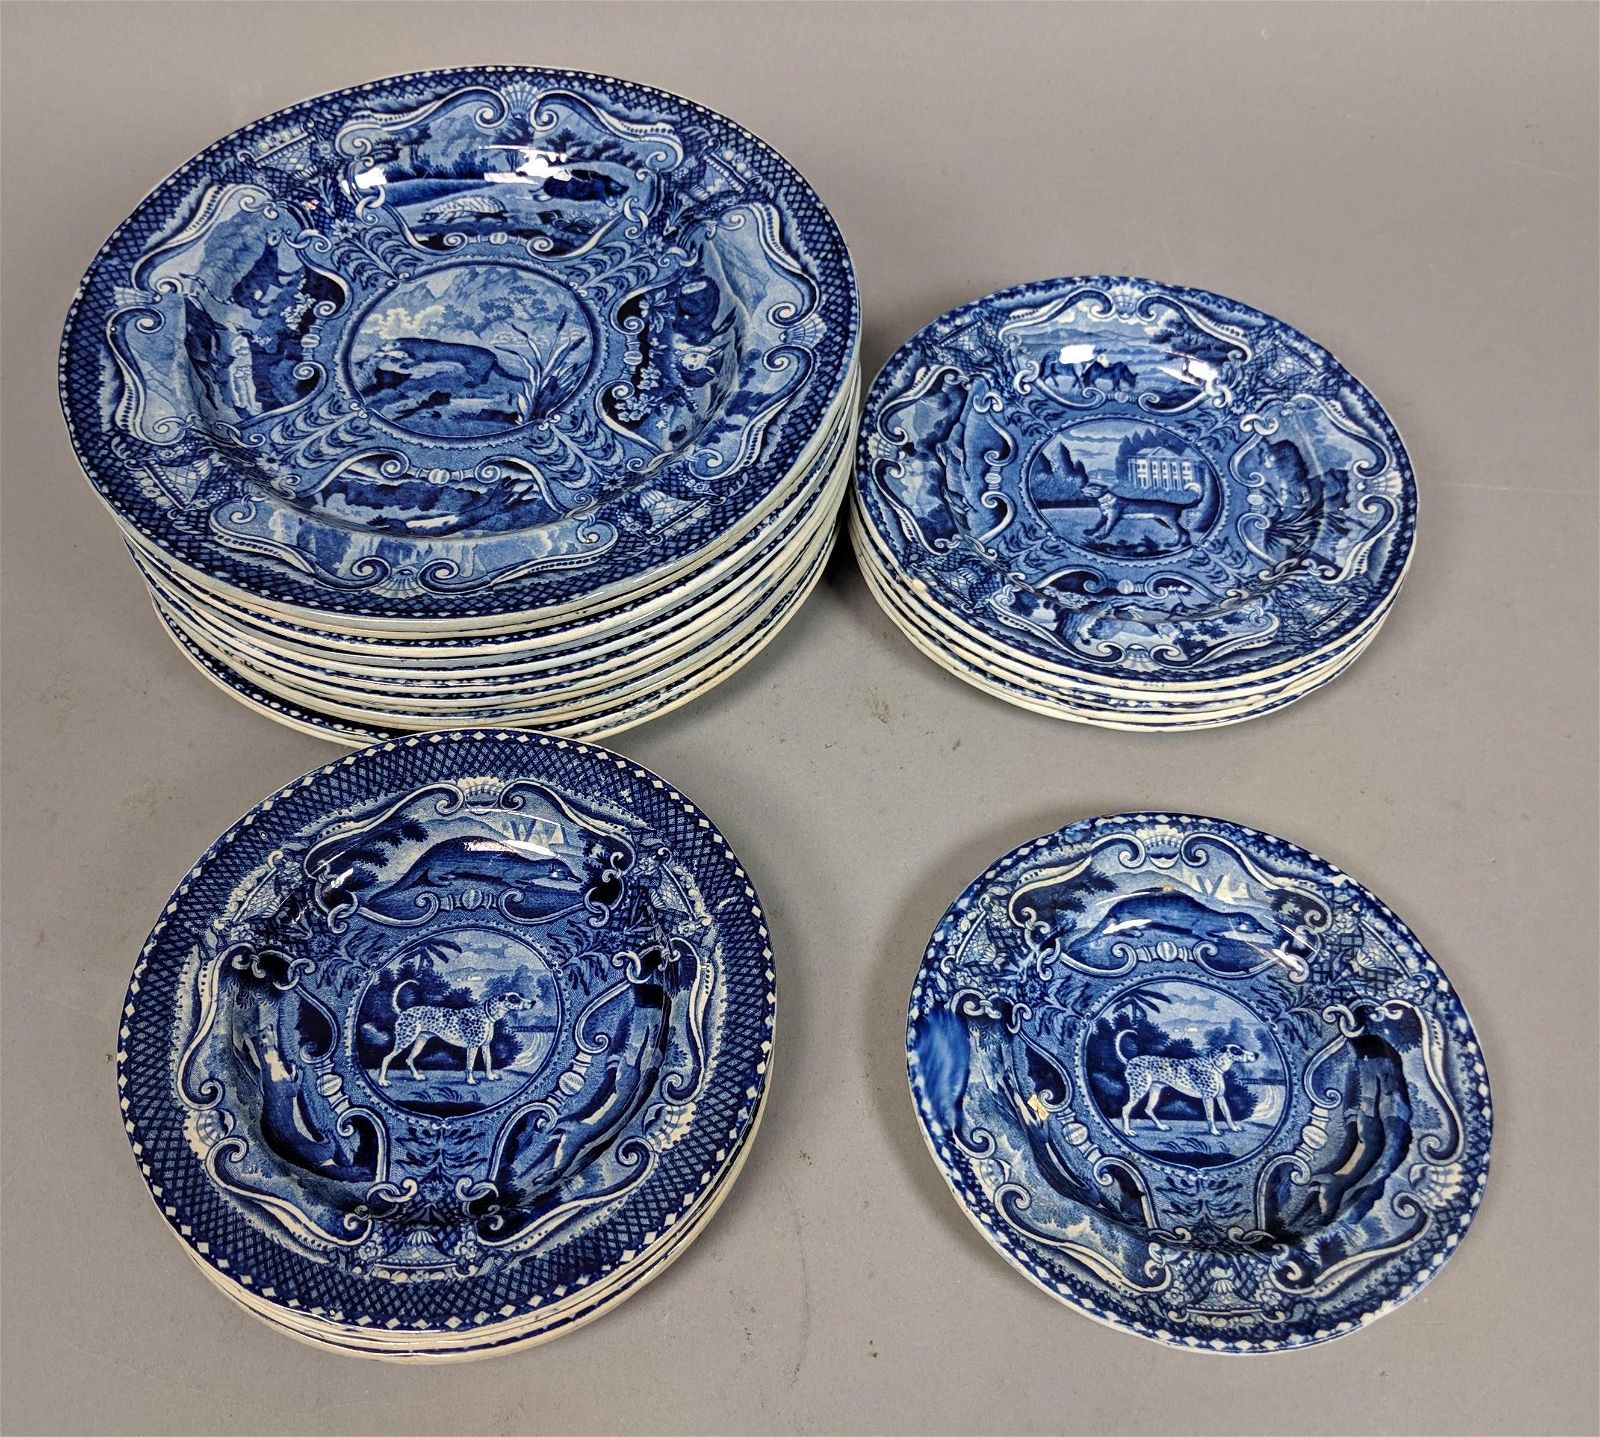 "23pc Set HALL Quadrupeds Plates. Twelve 9"" plates"